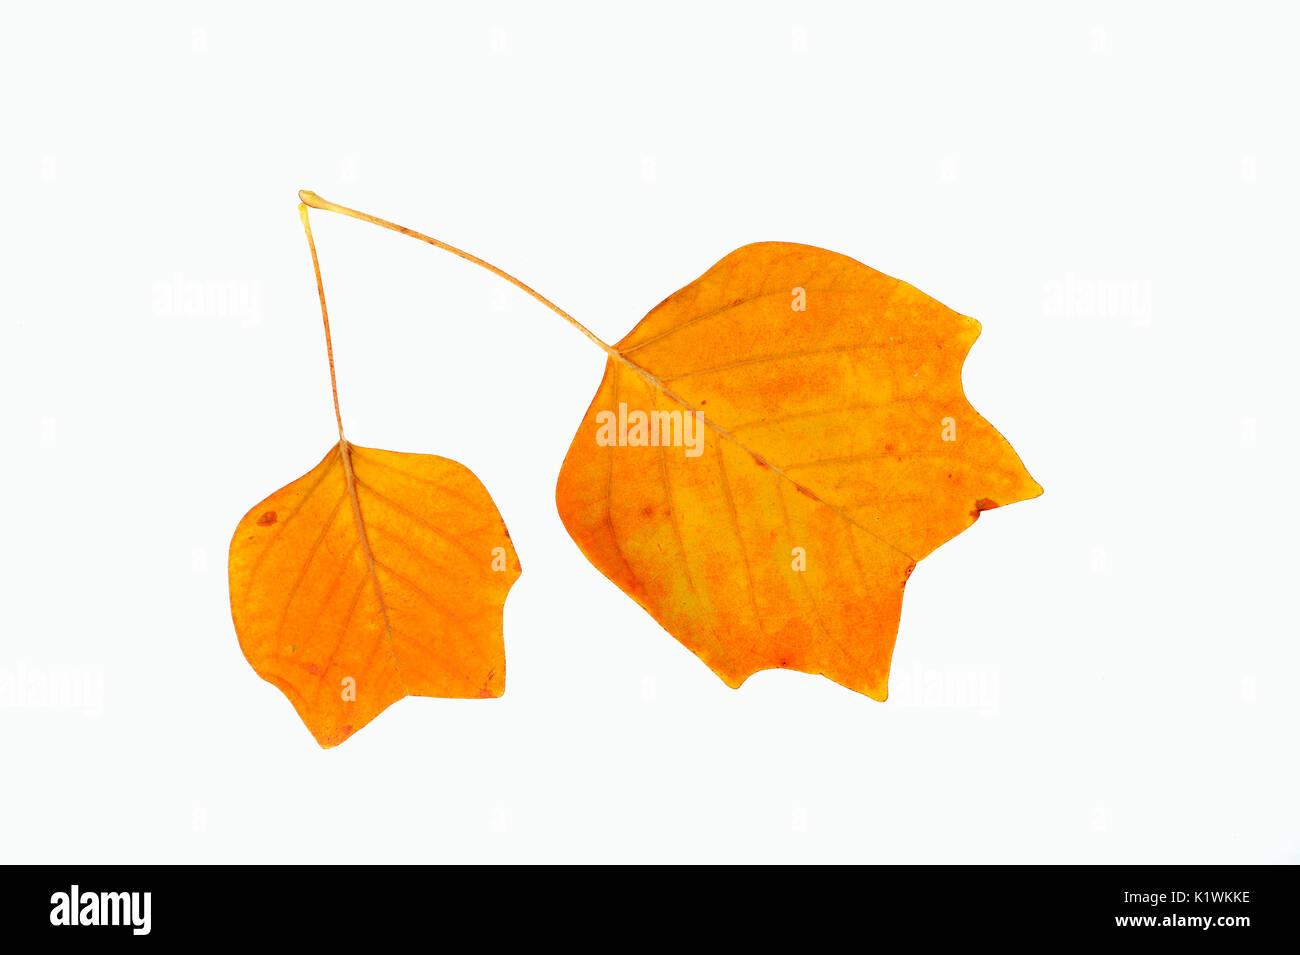 Tulip Tree, leaves in autumn / (Liriodendron tulipifera) | Tulpenbaum, Blaetter im Herbst / (Liriodendron tulipifera) - Stock Image